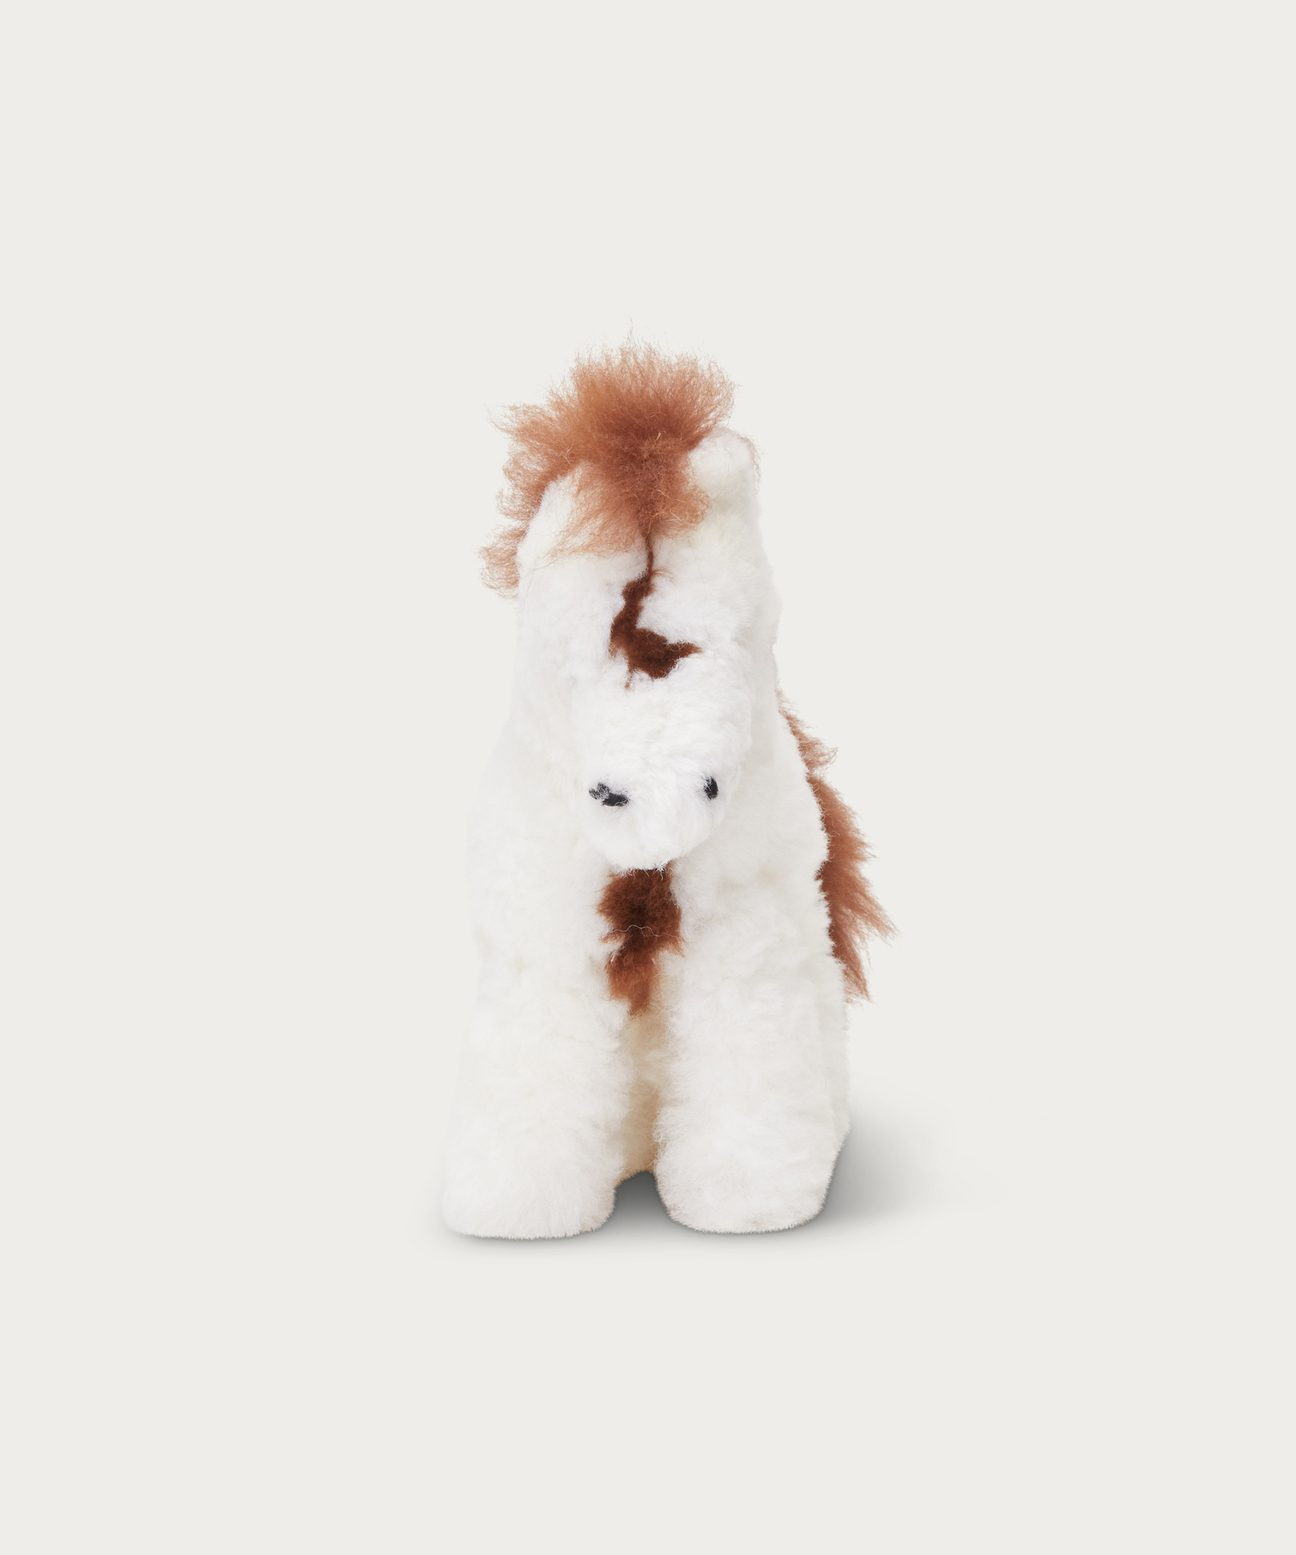 Alpaca Fur Horse Jenni Kayne